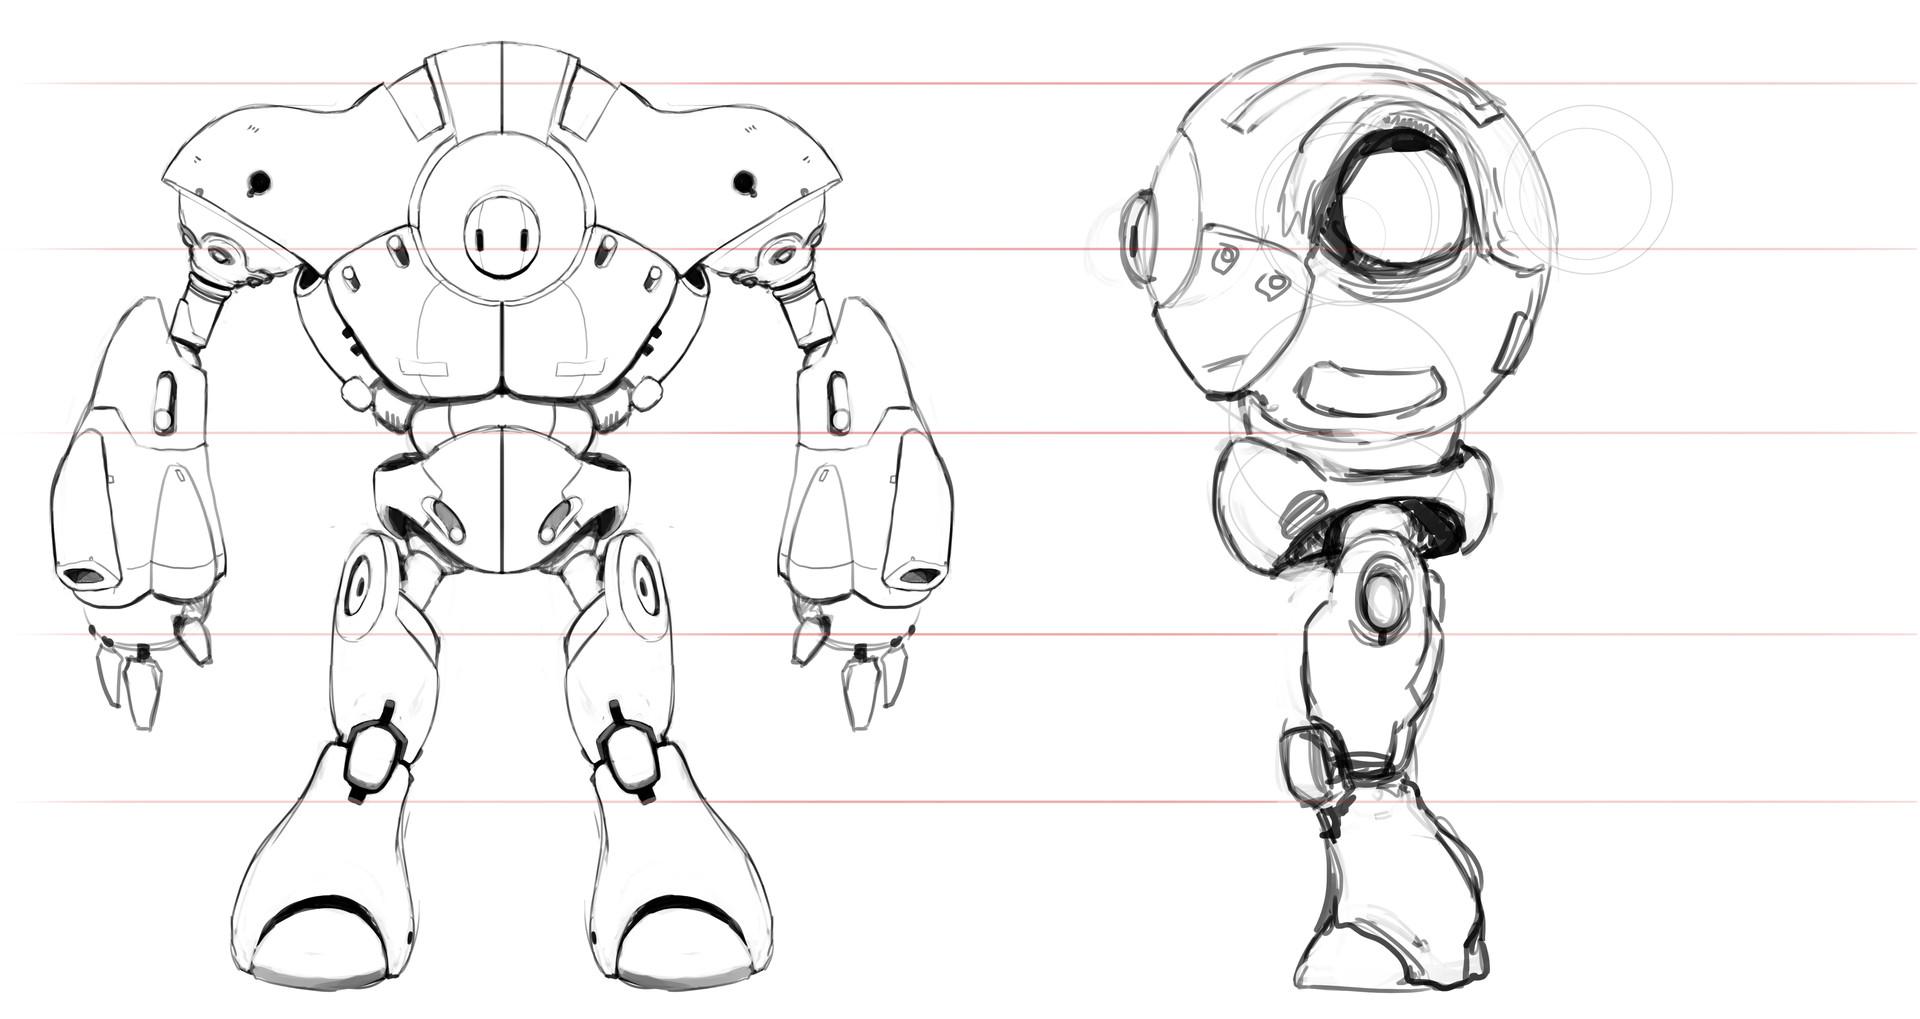 Victor hugo sousa robot model stop bot